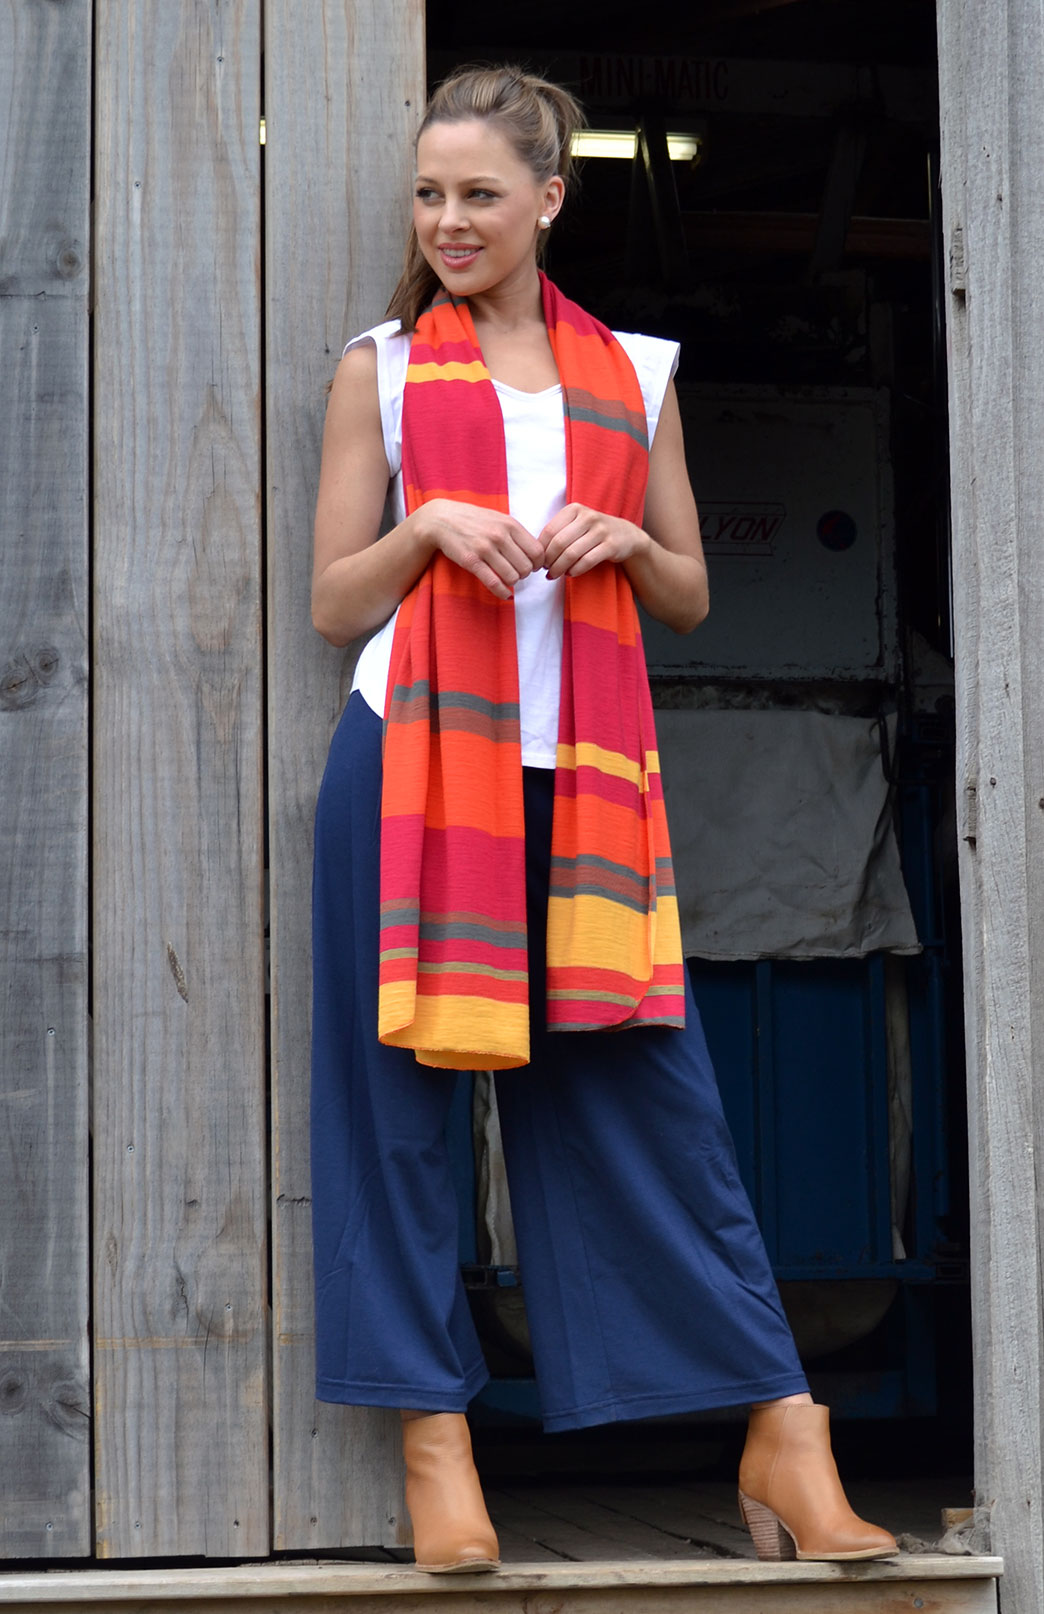 Wide Leg Crop Pant - Plain - Women's wool crop pants with wide legs and wide waistband - Smitten Merino Tasmania Australia